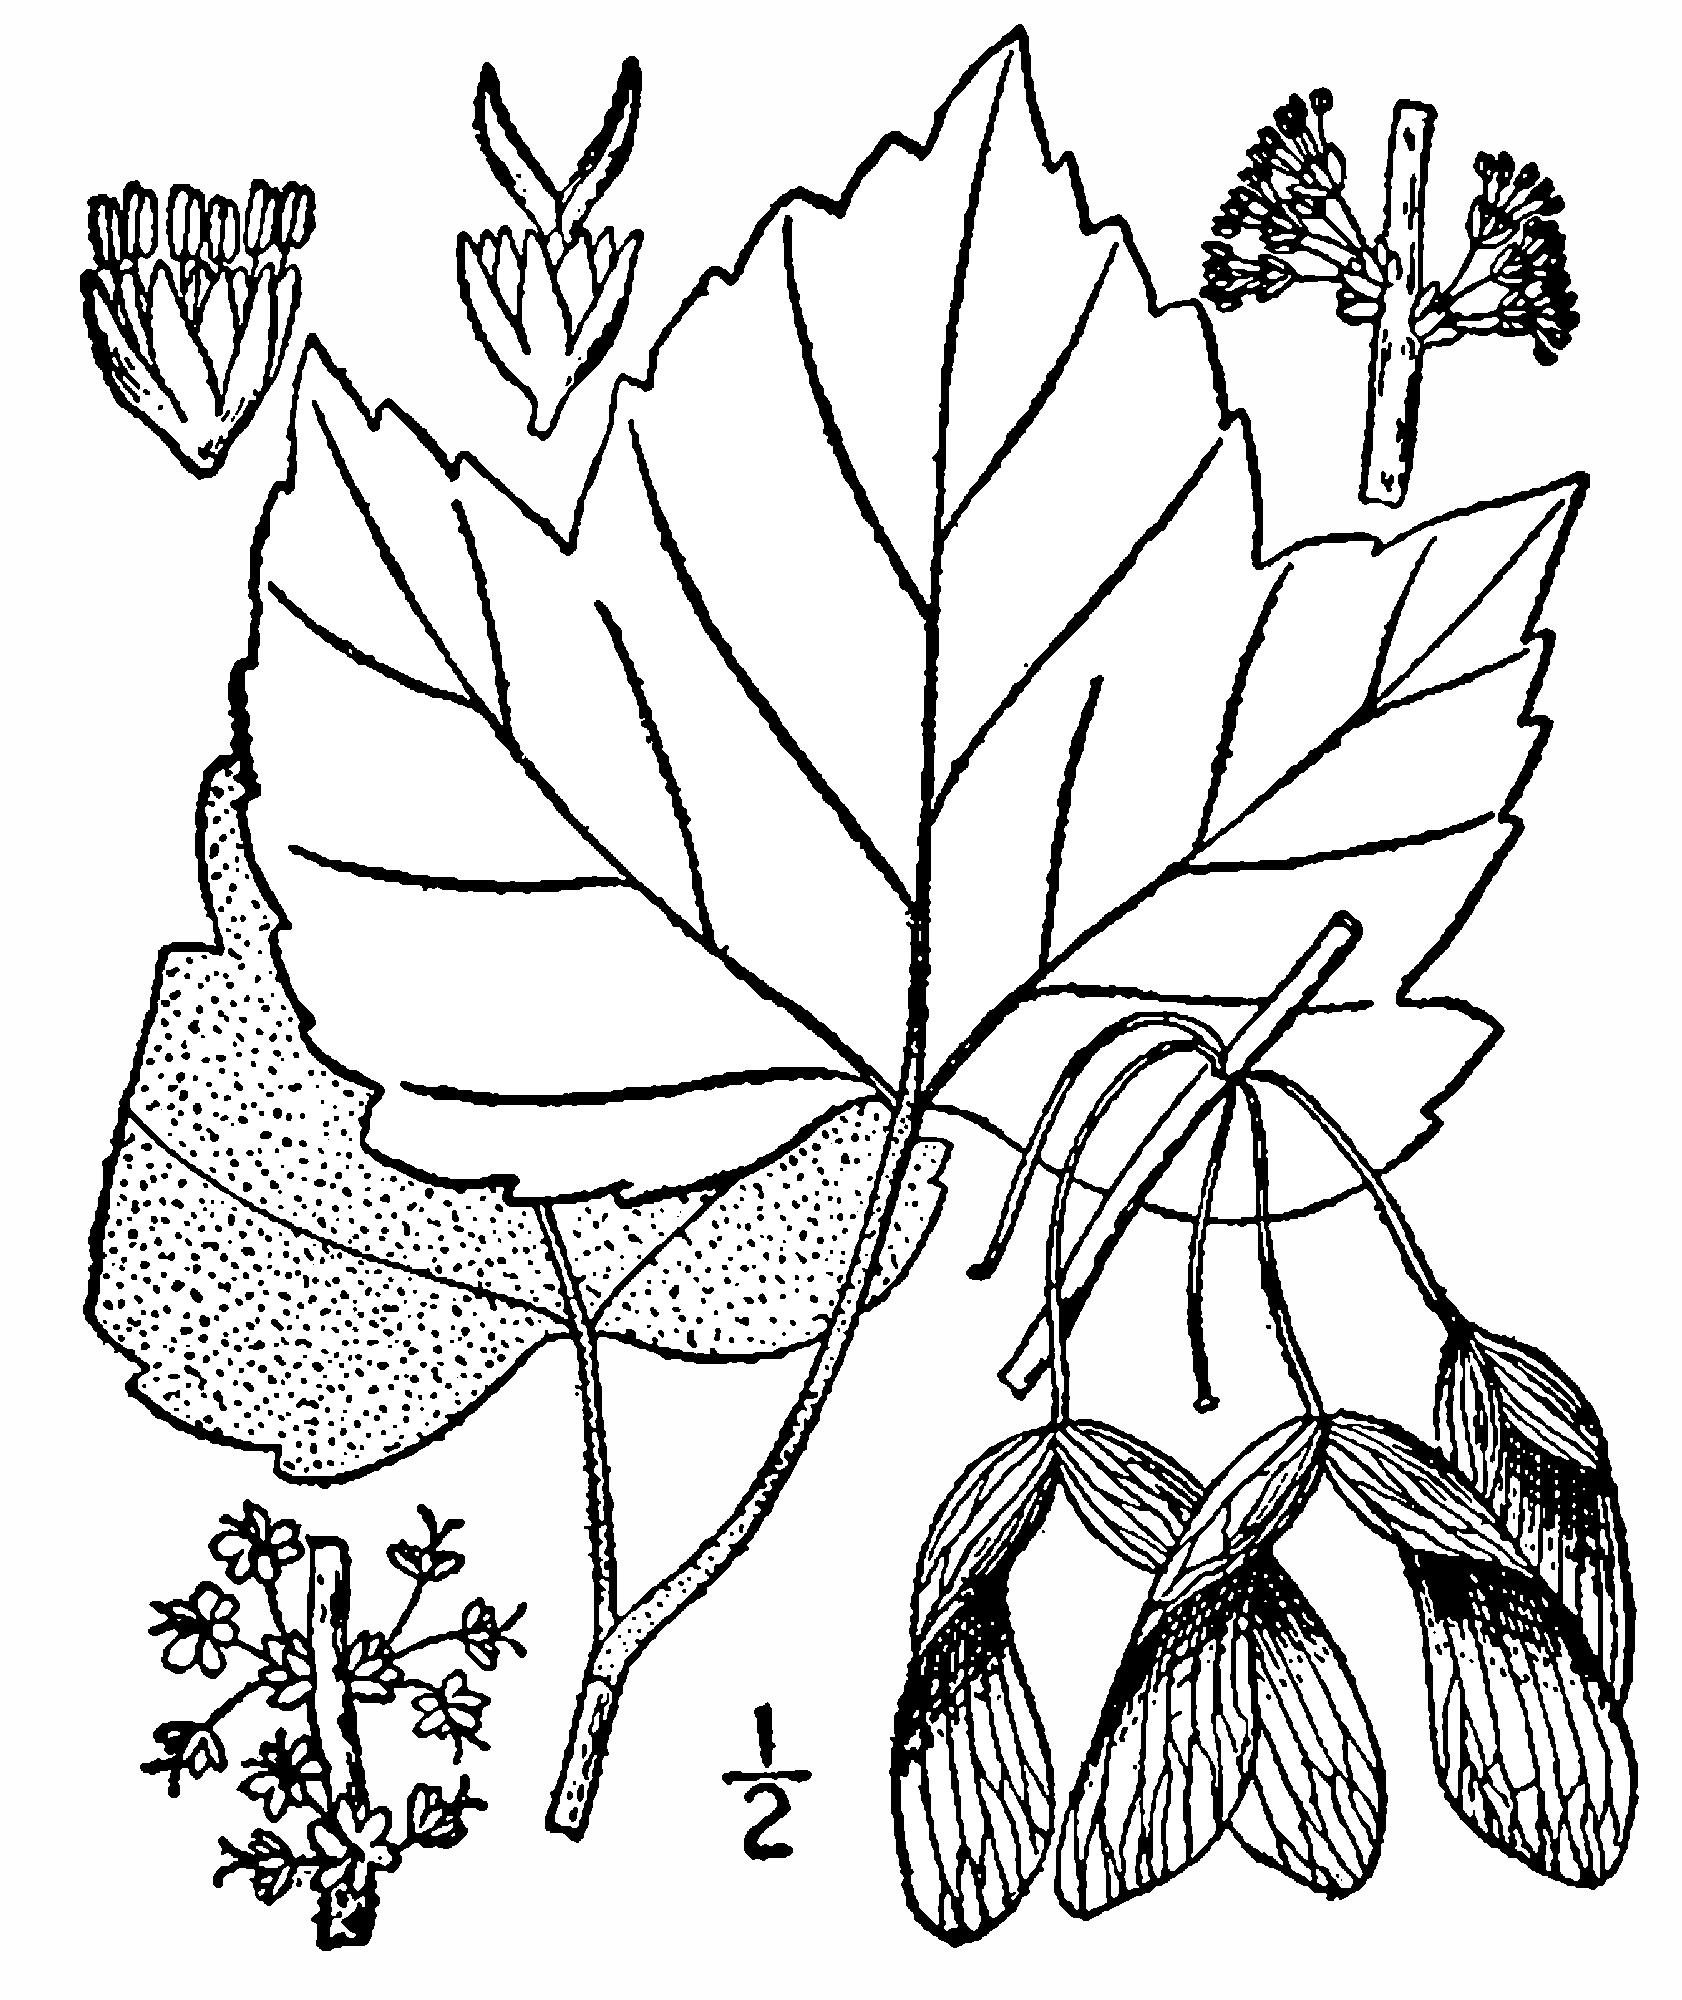 File Acer rubrum drummondii drawing Wikimedia mons